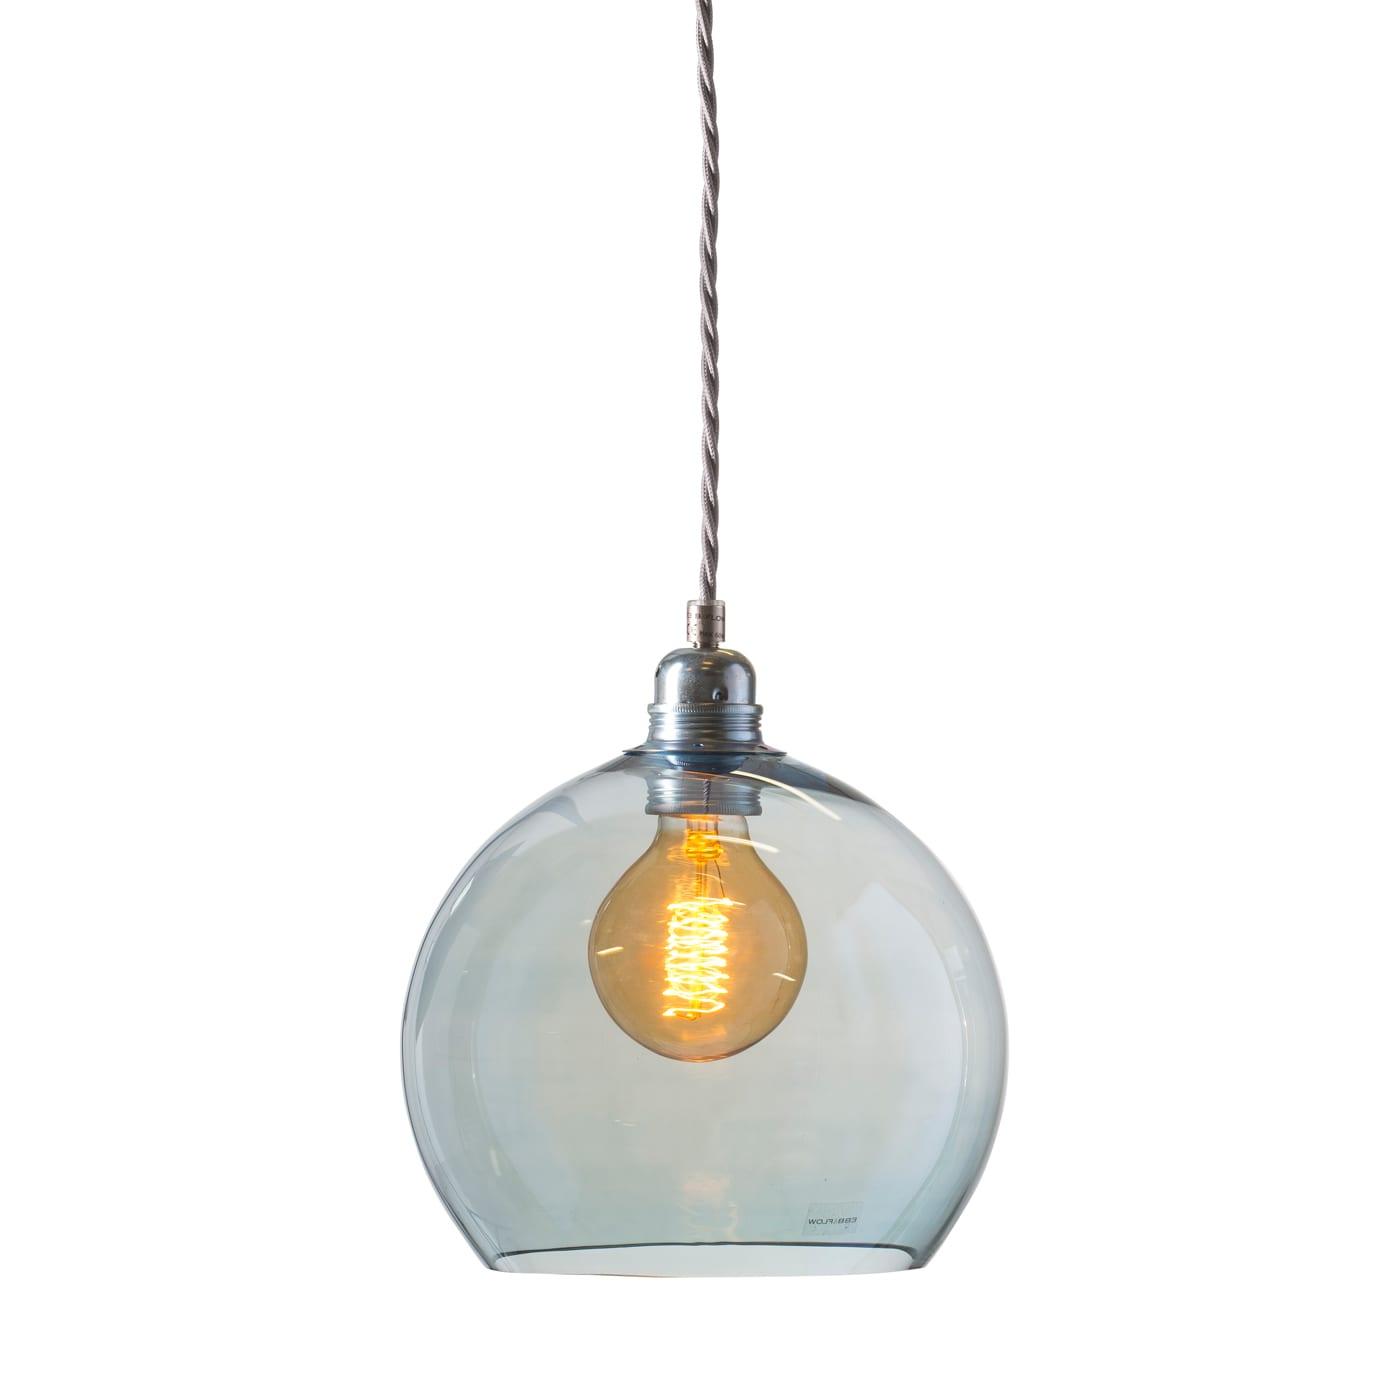 Rowan pendant lamp, topaz blue, 22cm